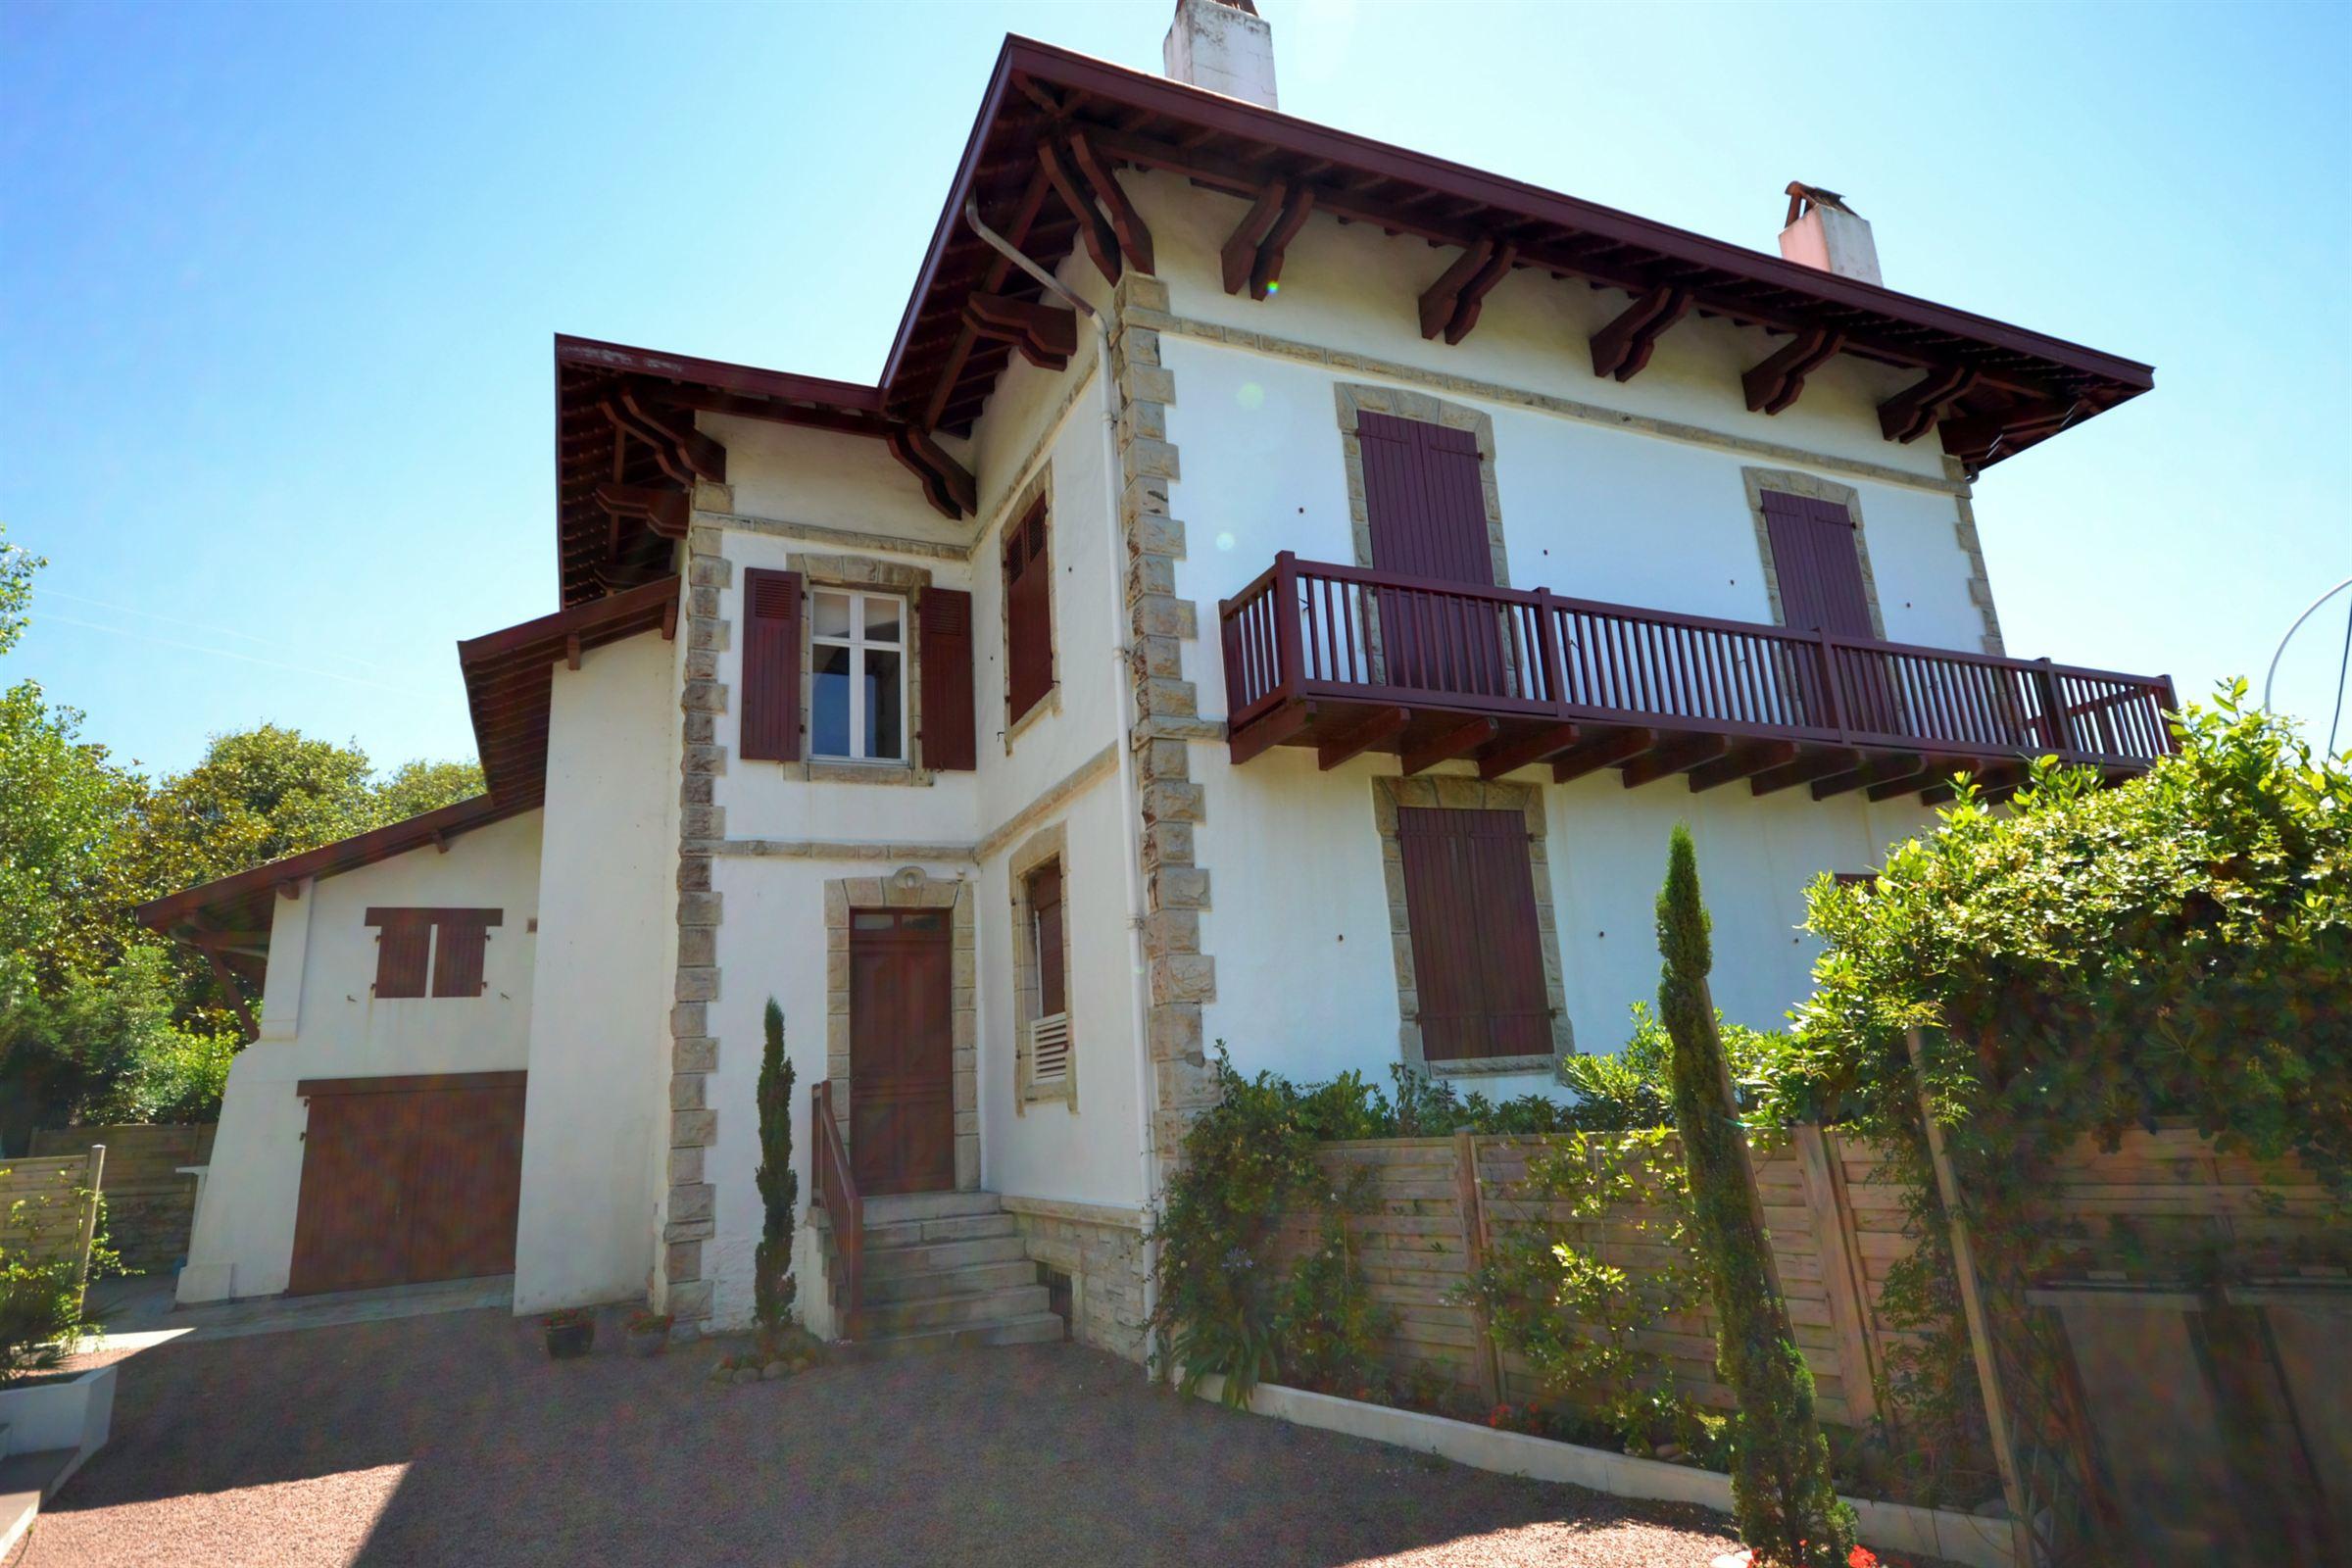 Apartment for Sale at BIARRITZ LE GOLF DU PHARE Biarritz, Aquitaine, 64200 France